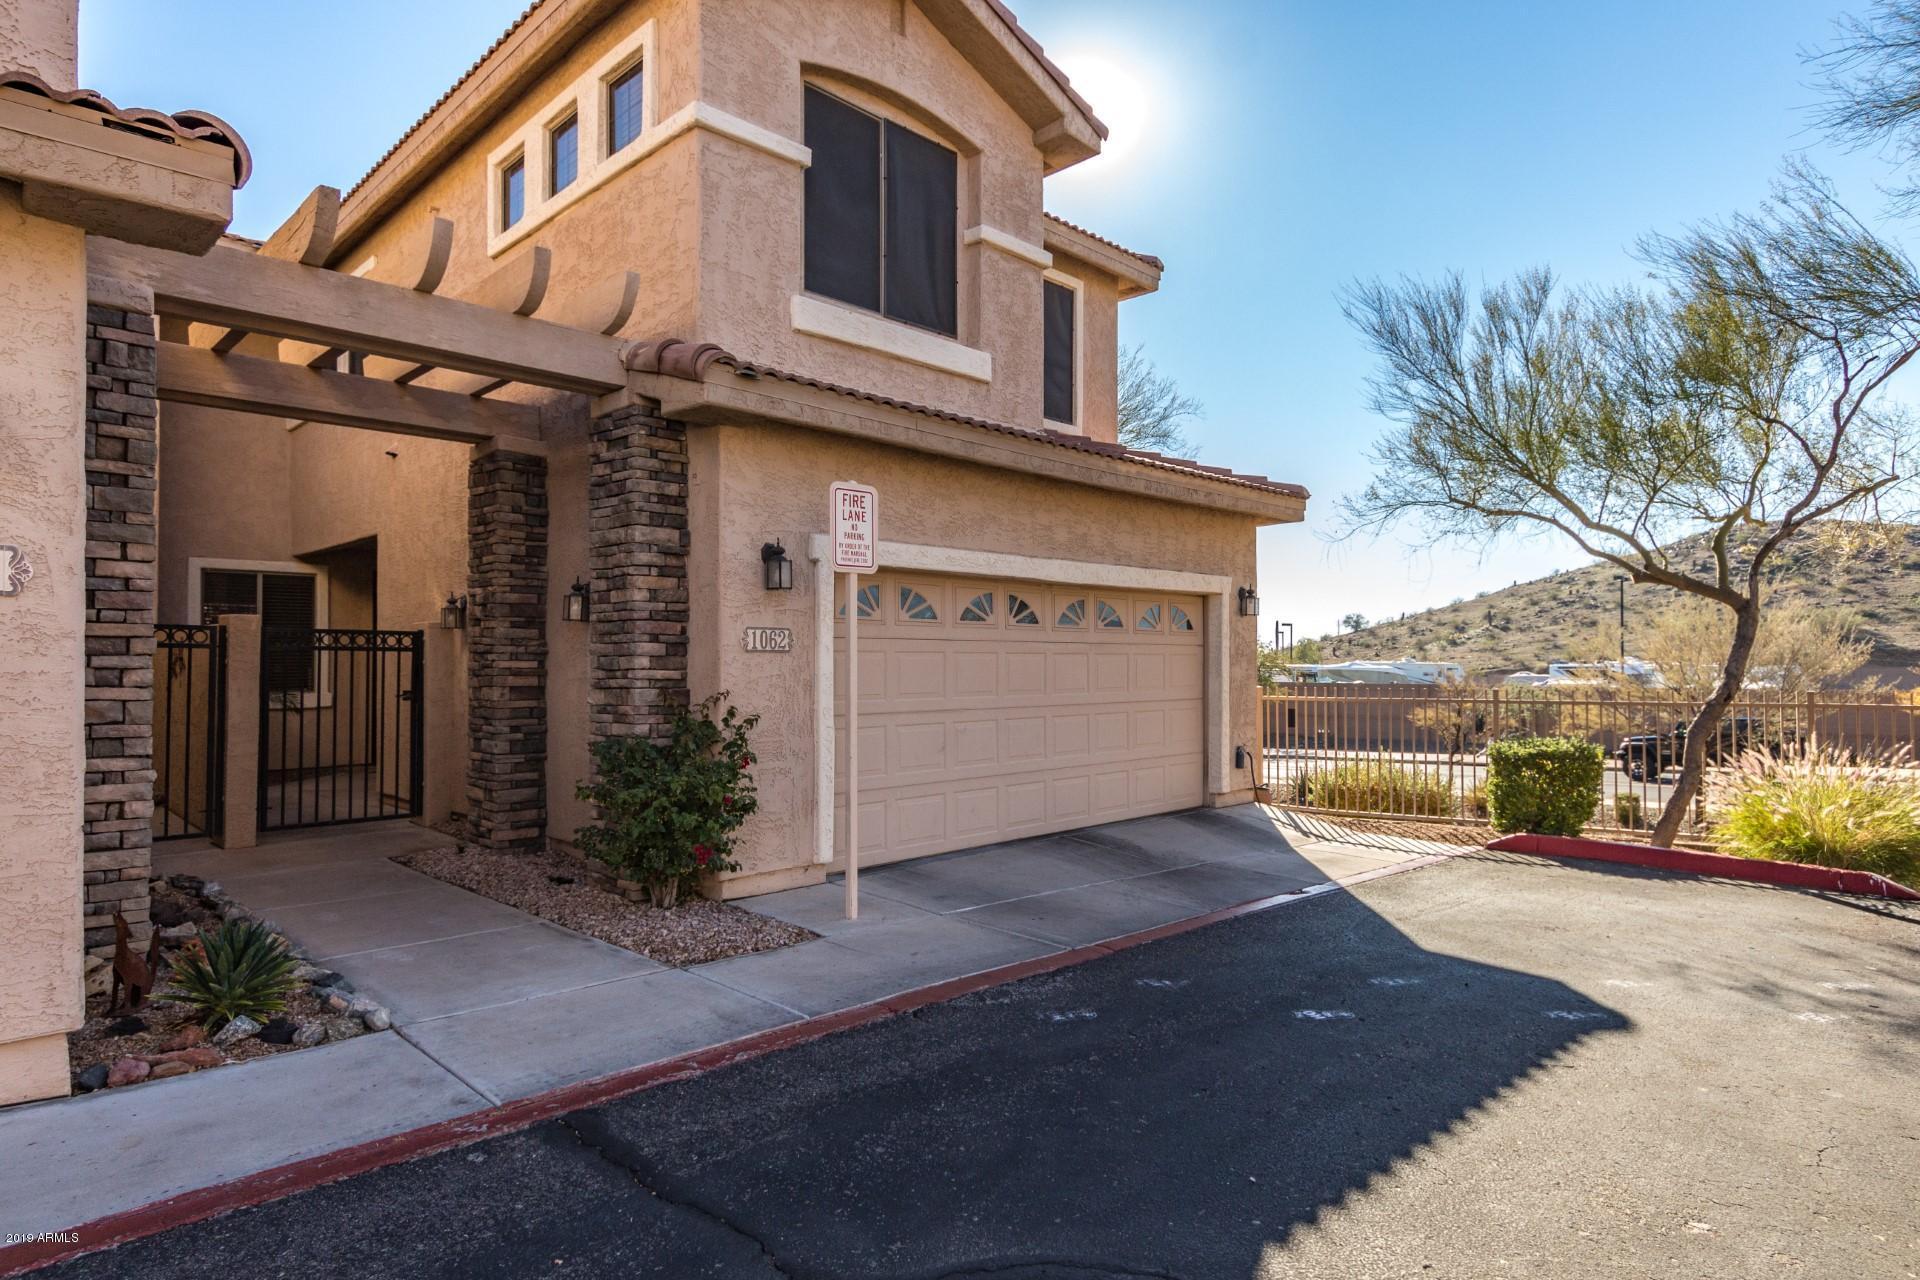 Photo of 1024 E FRYE Road #1062, Phoenix, AZ 85048